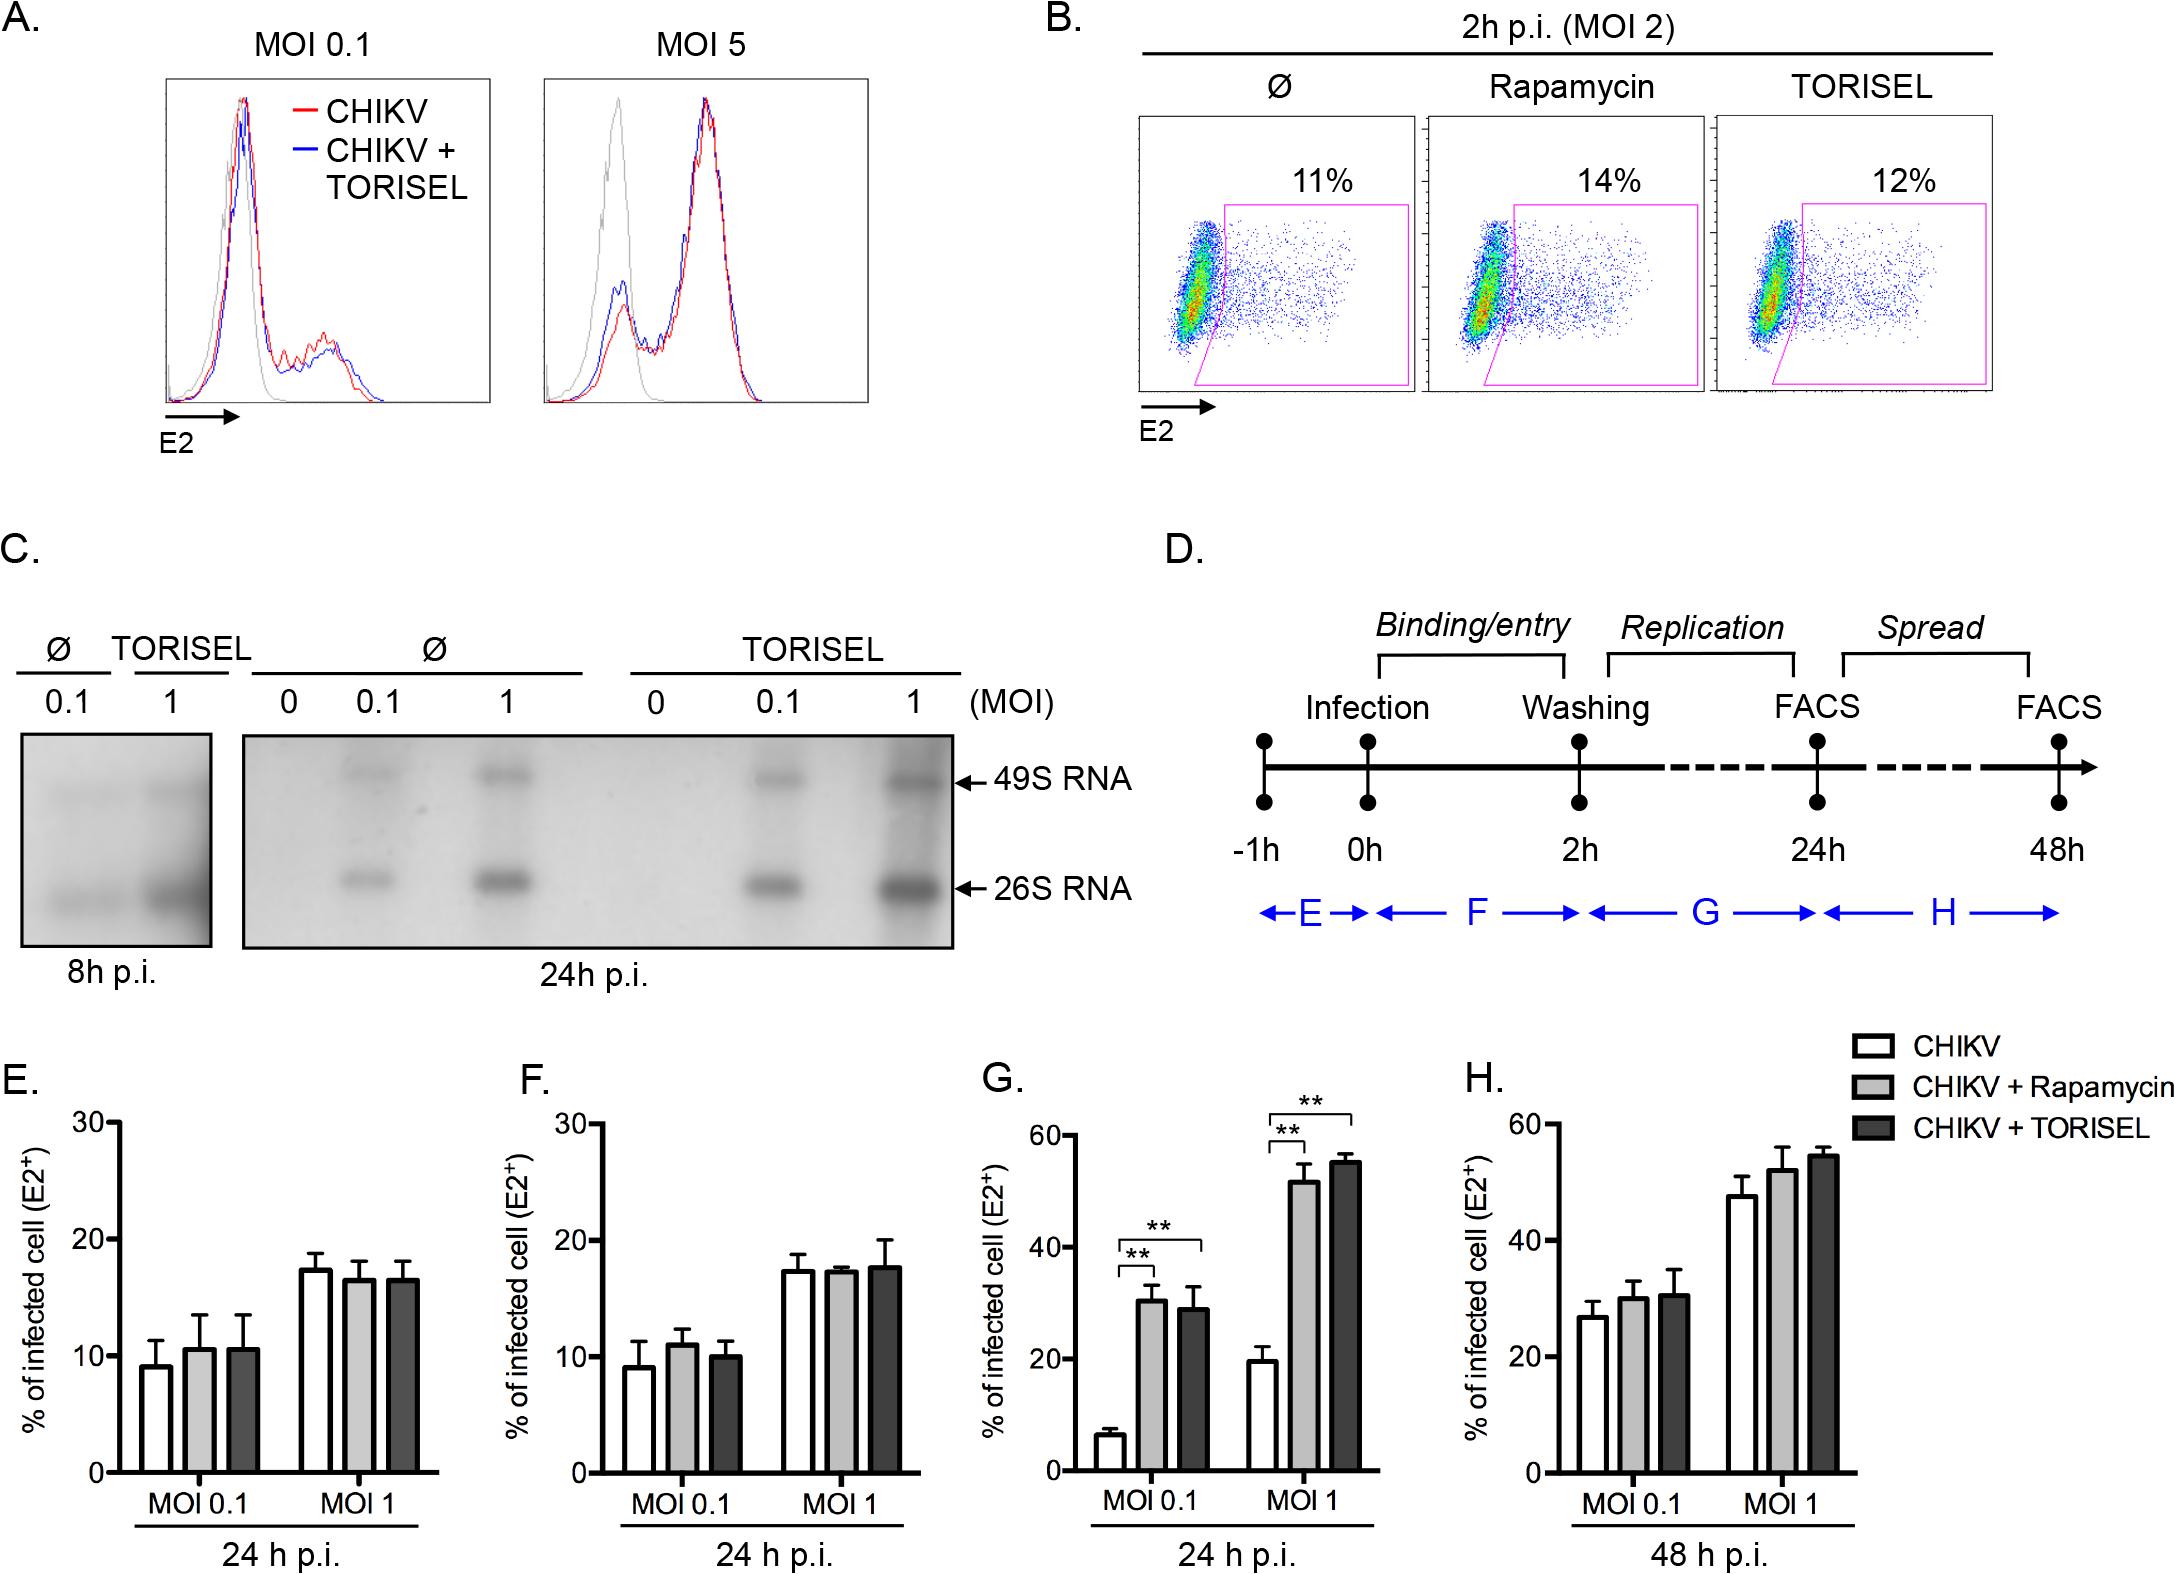 Rapalog treatment enhances viral replication.